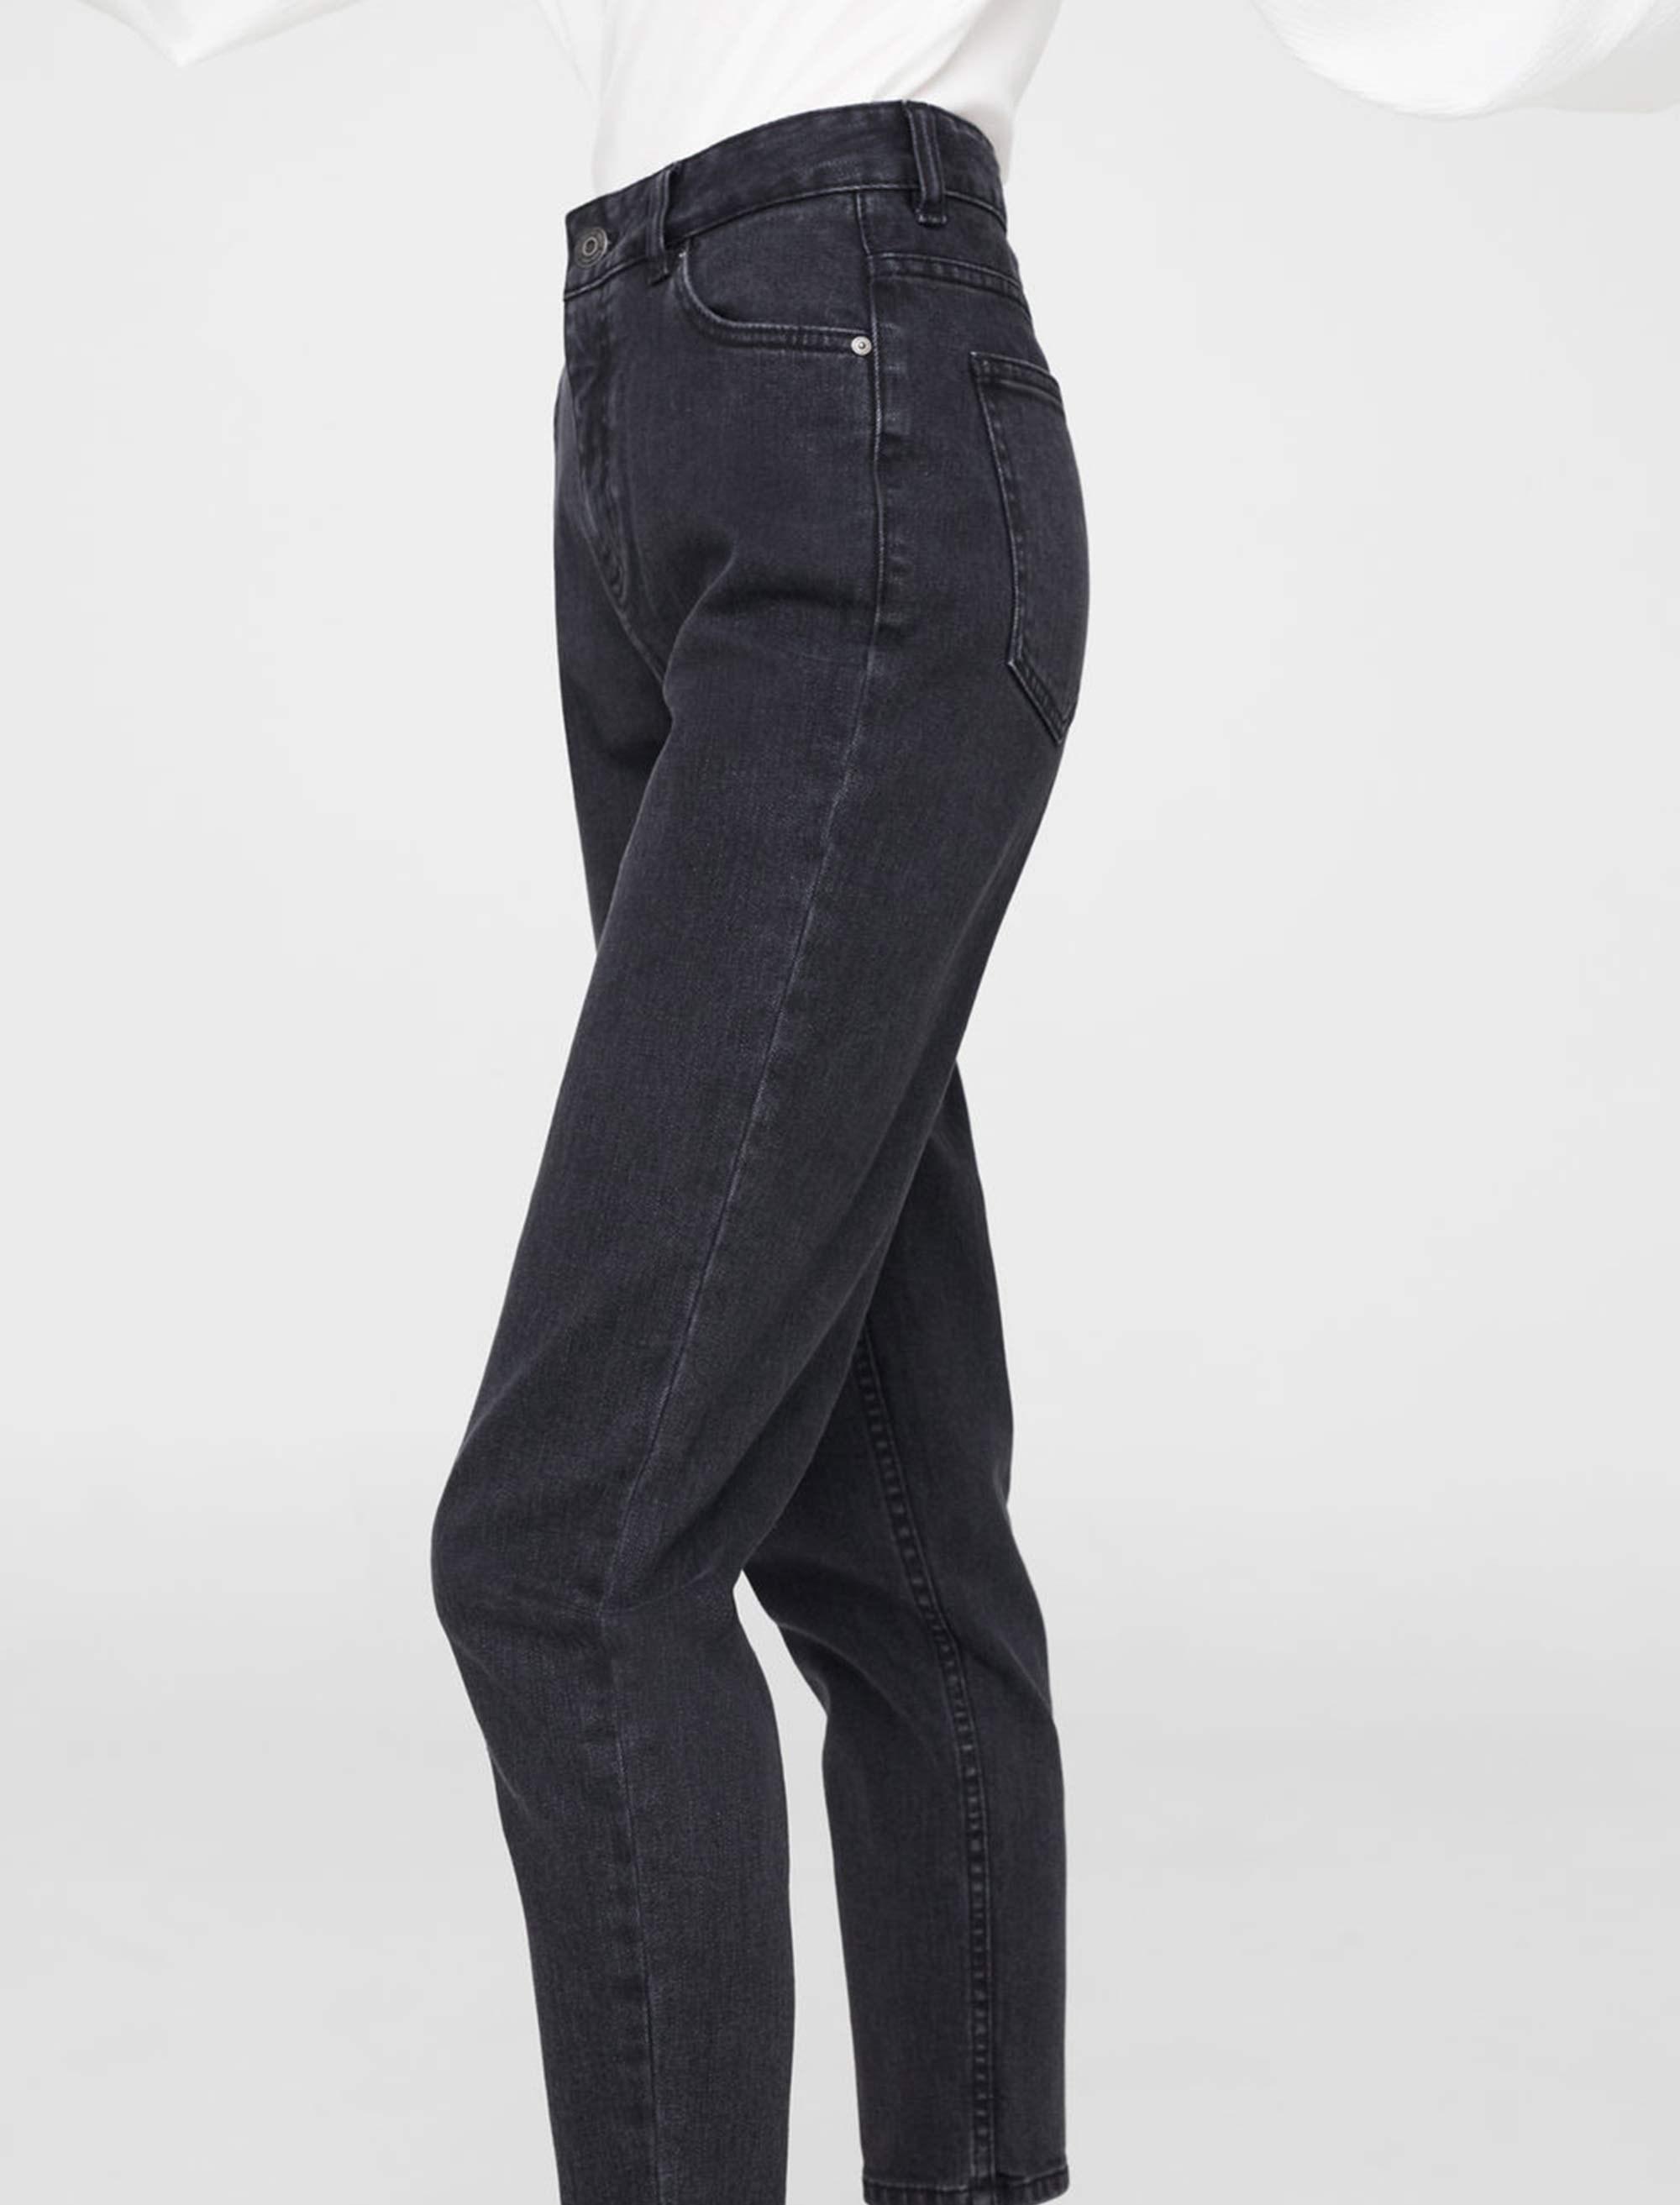 شلوار جین راسته زنانه - مانگو - زغالي - 4